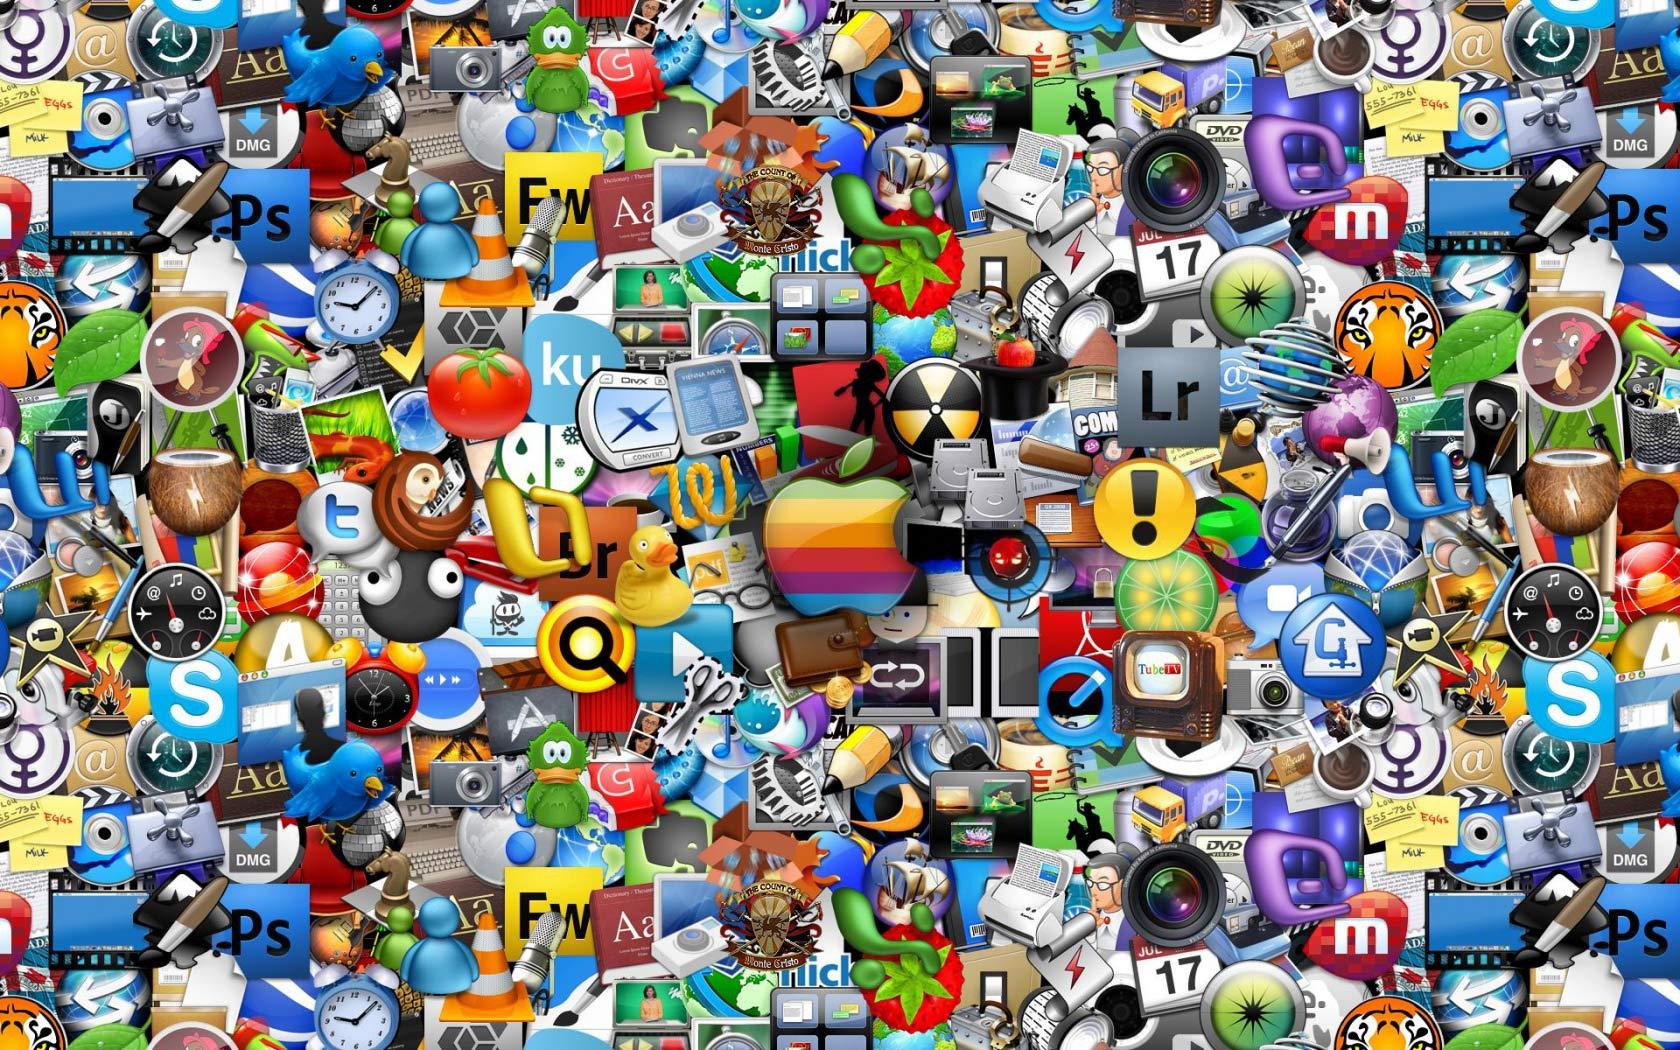 iPad applications desktop Wallpaper High Quality Wallpapers 1680x1050